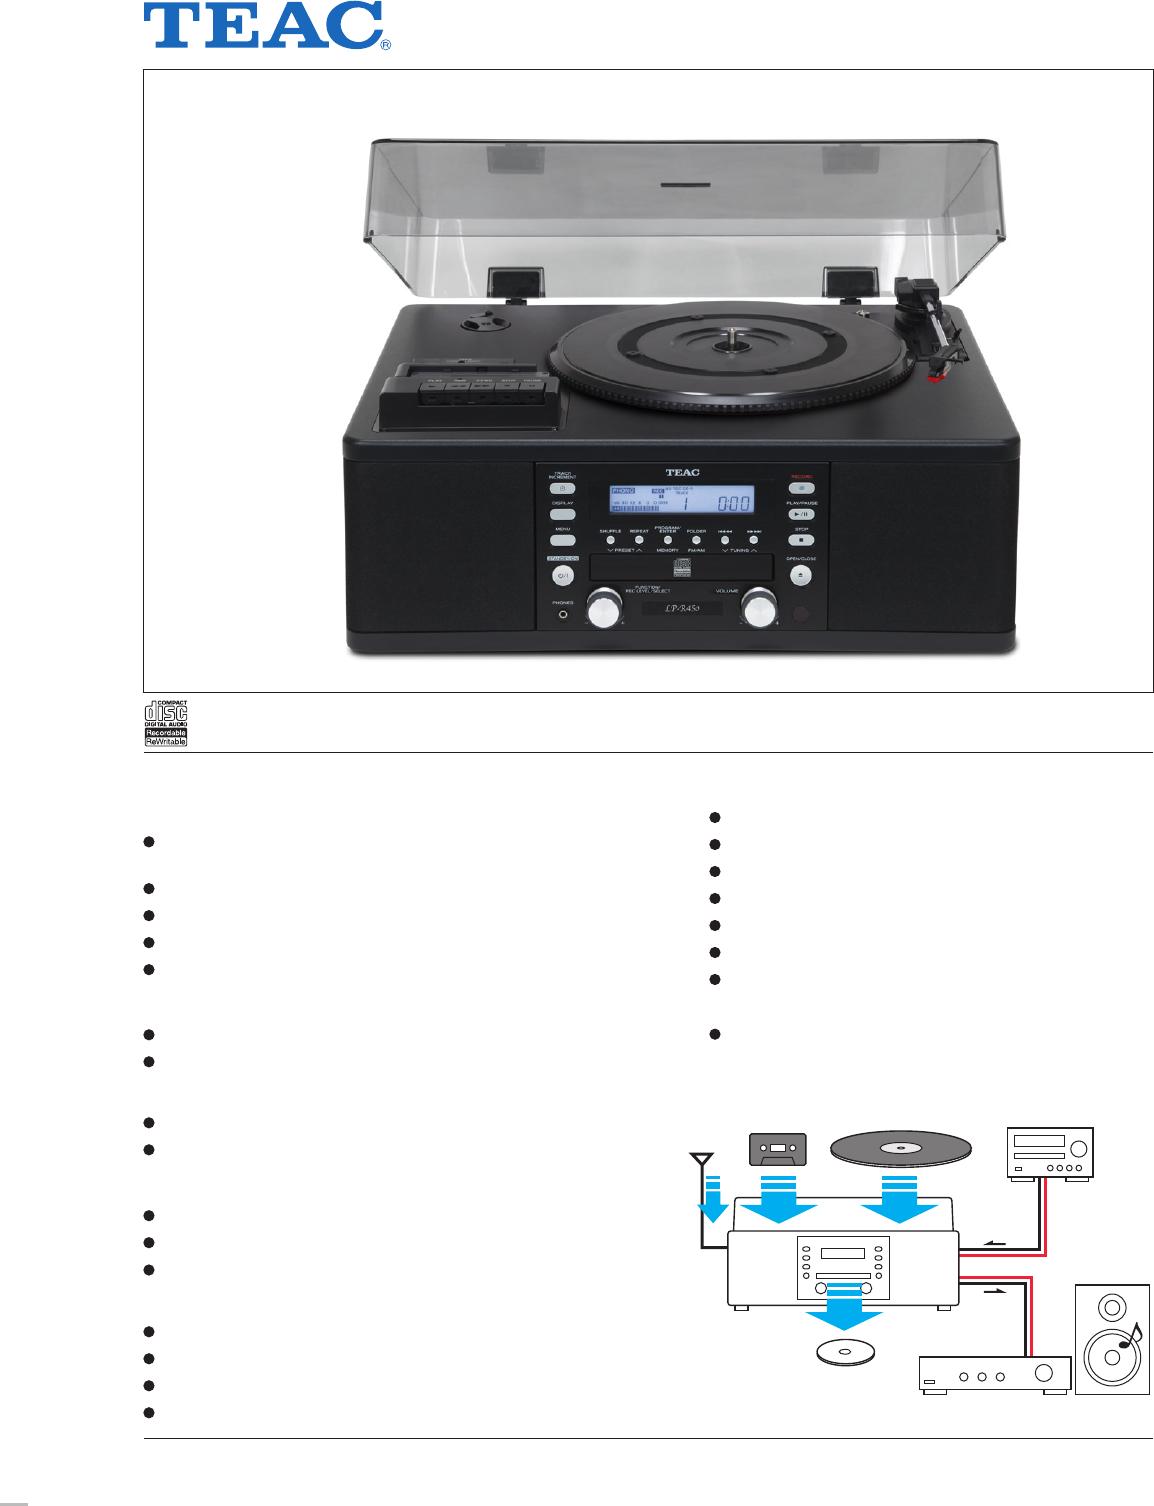 Teac LP R450 R450(rev0)LT User Manual To The F340fada 4629 4ab6 ...